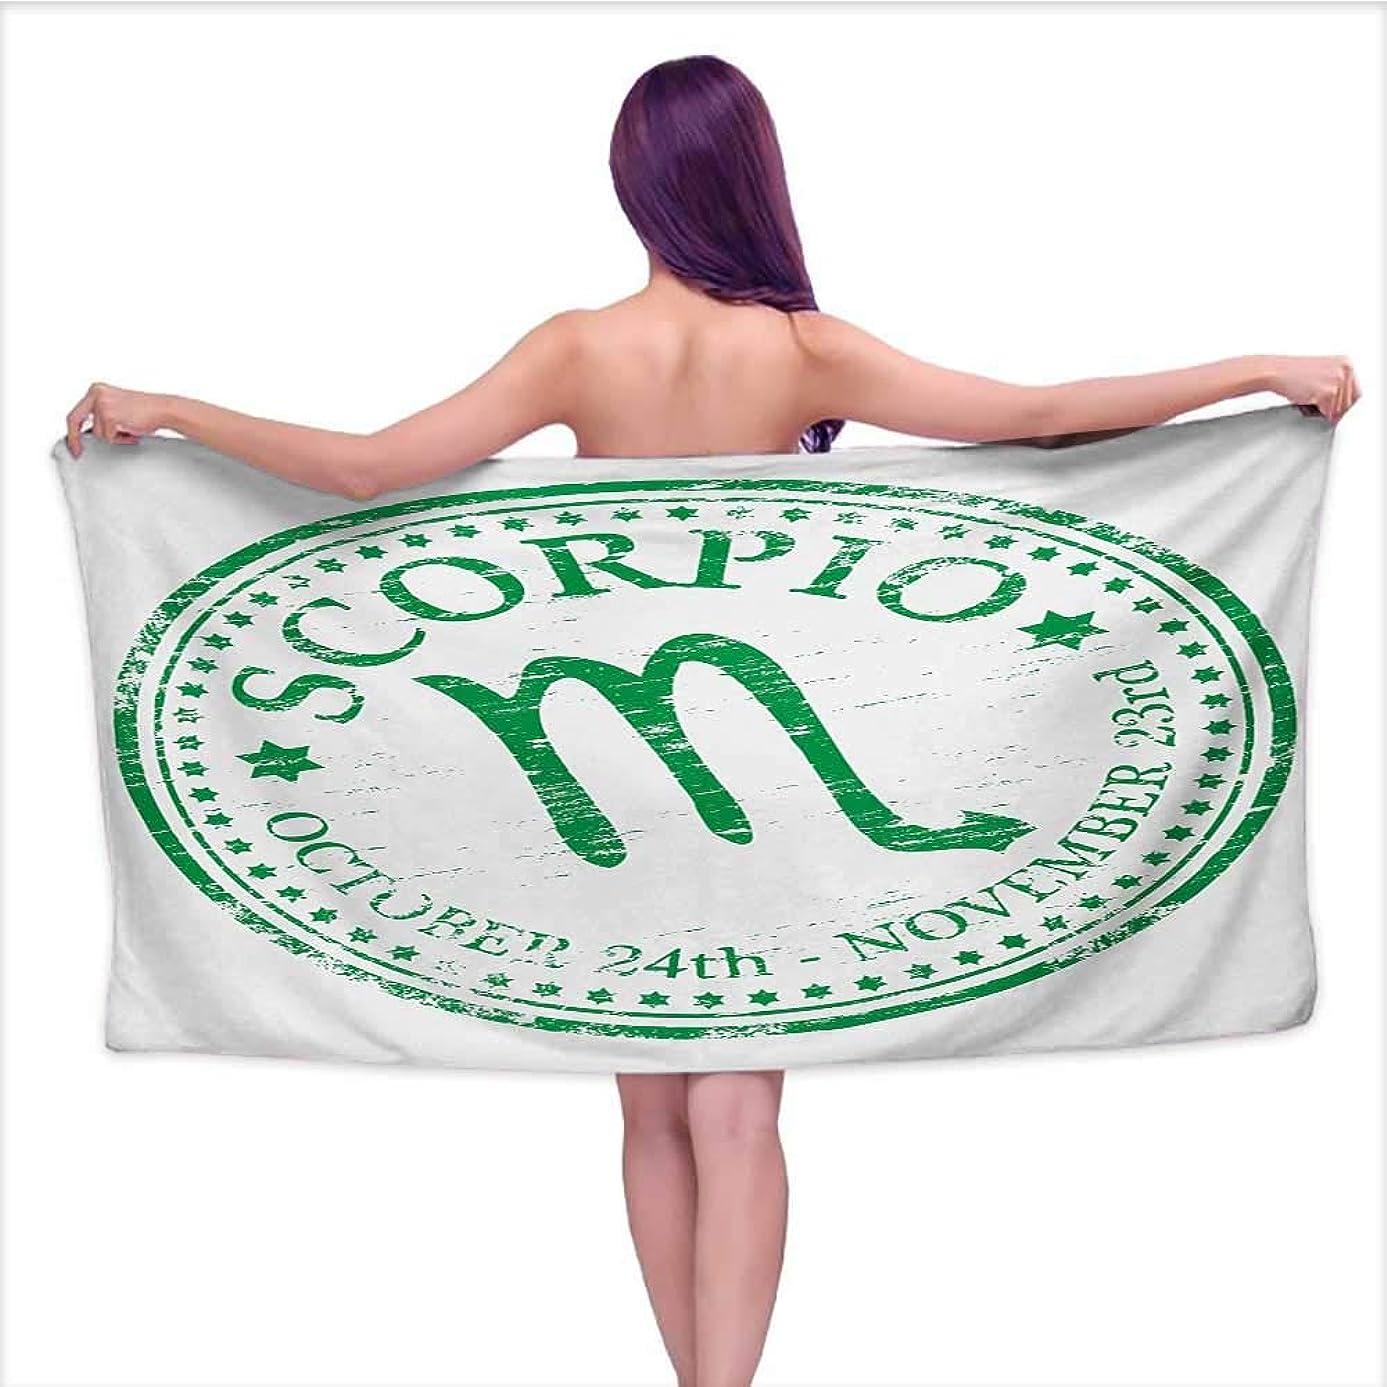 Bensonsve Bath Towel mat Zodiac Scorpio,Retro Zodiac Rubber Stamp Design with Grunge Look Stars and Dates,Fern Green and White,W10 xL39 for Beach